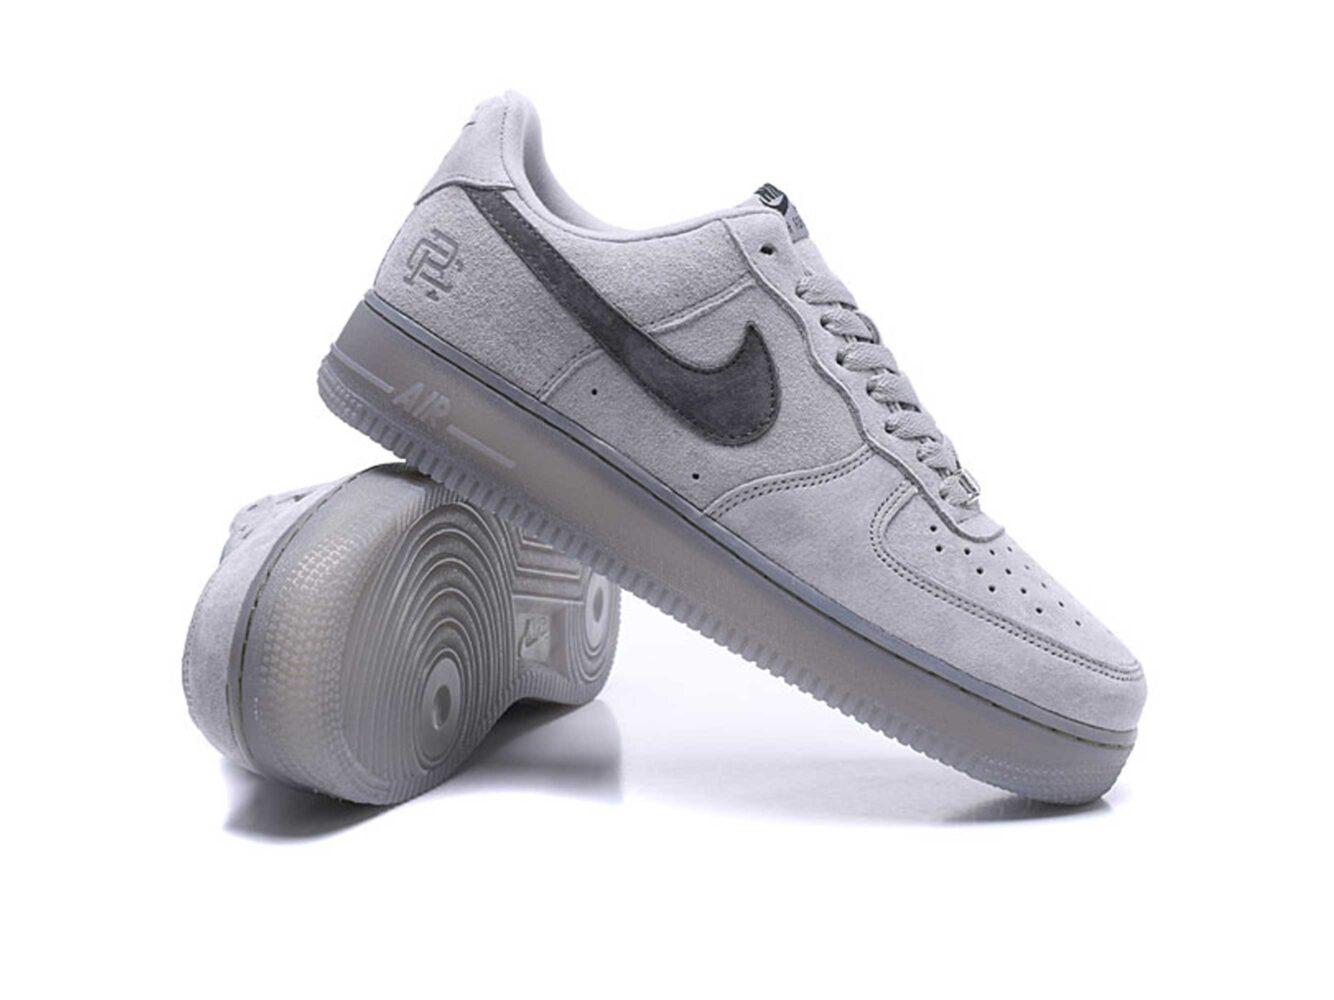 nike air force 1 low grey x Reigning Champ купить